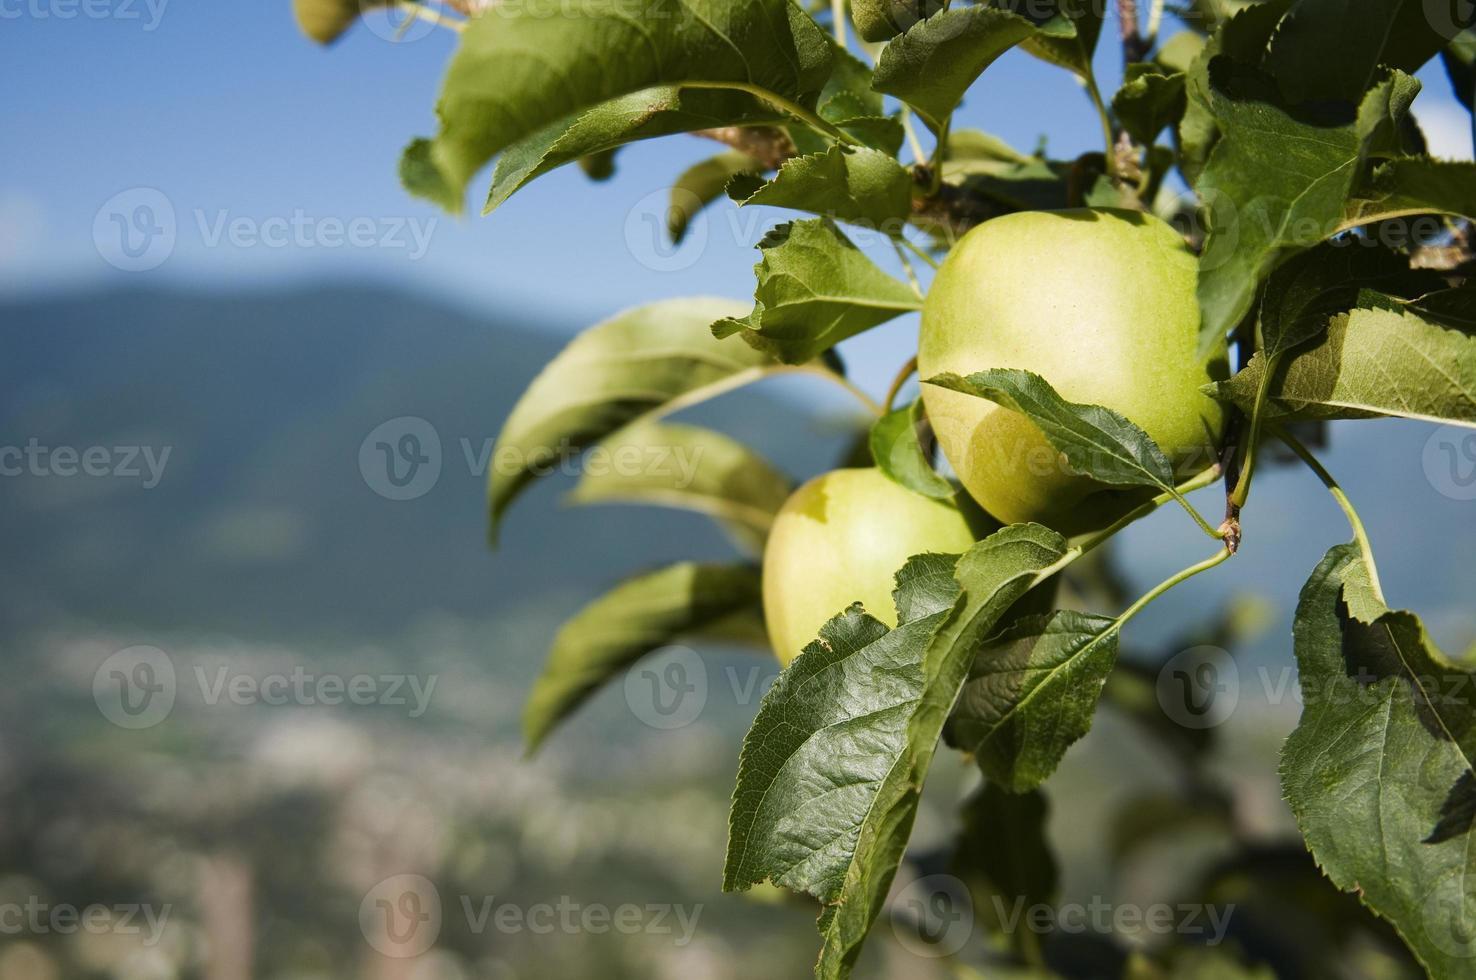 due mele sull'albero foto